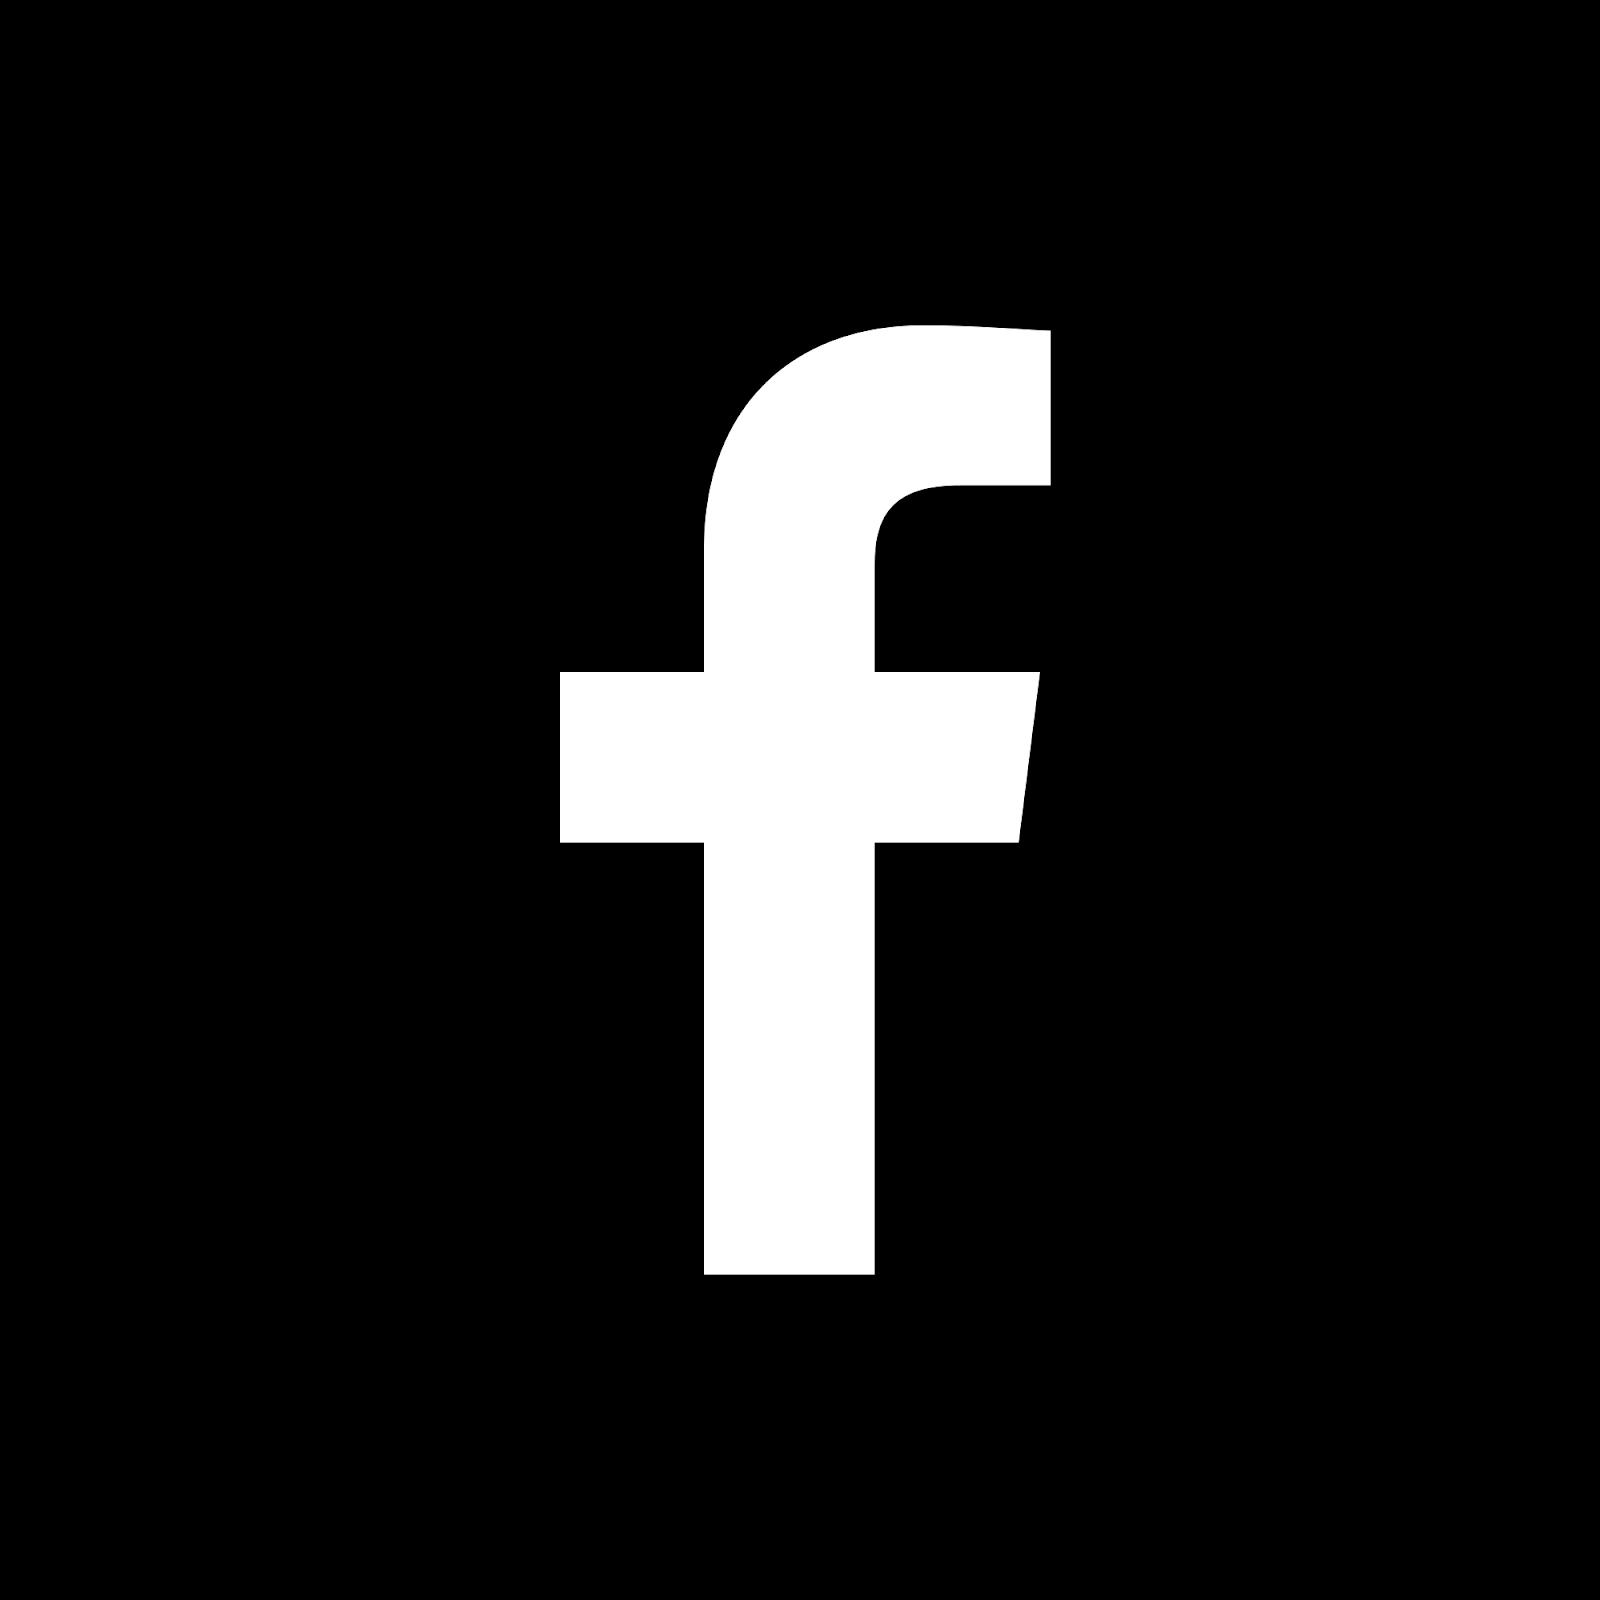 File:Facebook icon (black).svg - Wikimedia Commons